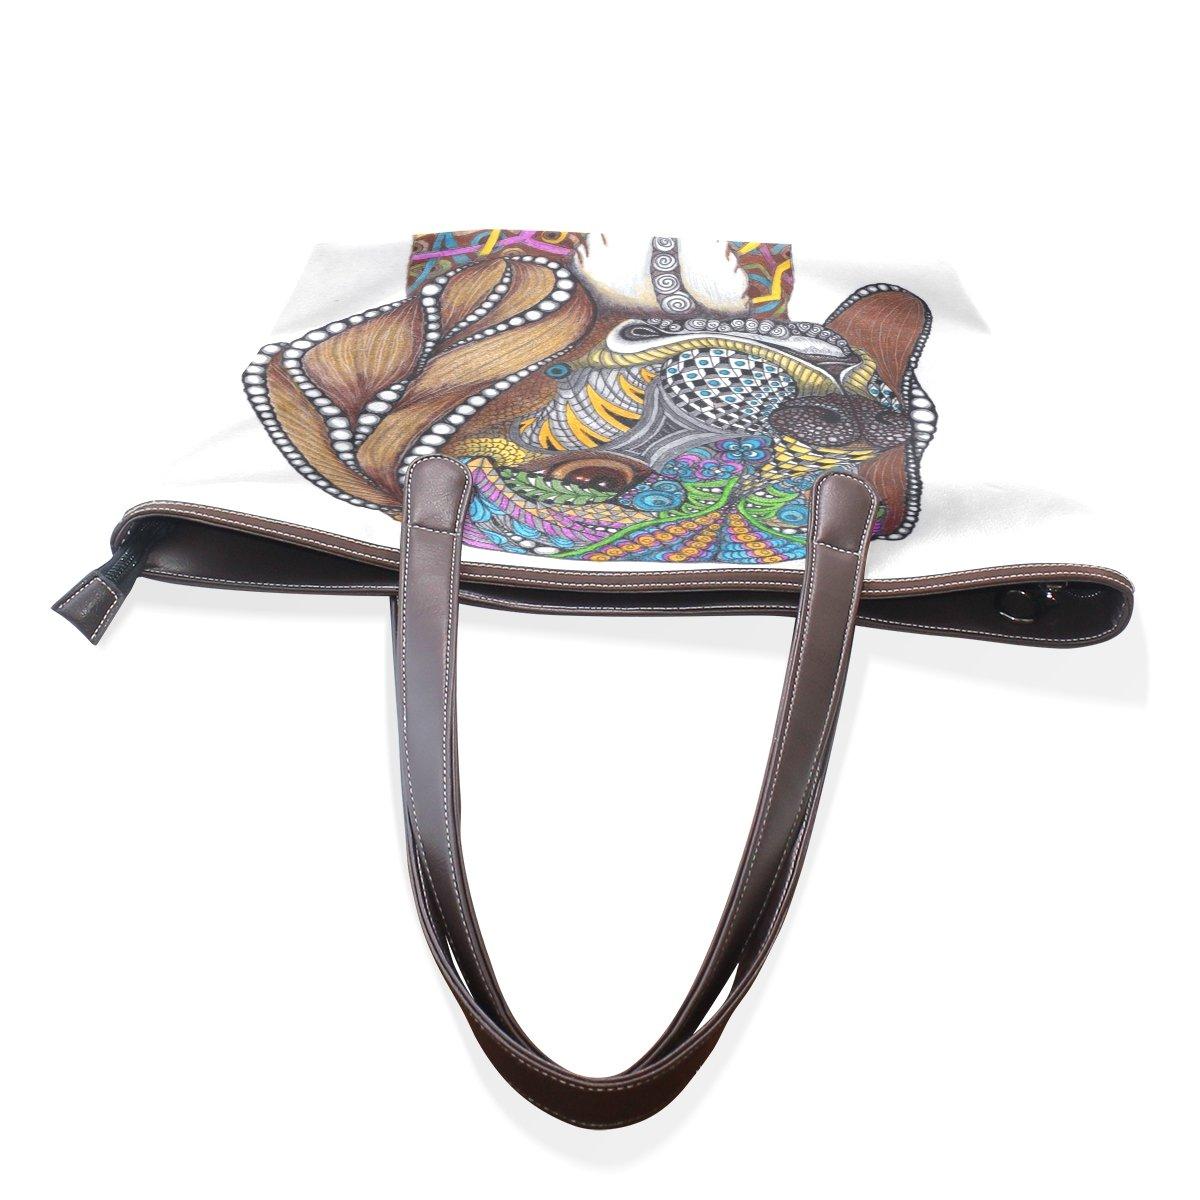 SCDS Watercolor Dog PU Leather Lady Handbag Tote Bag Zipper Shoulder Bag